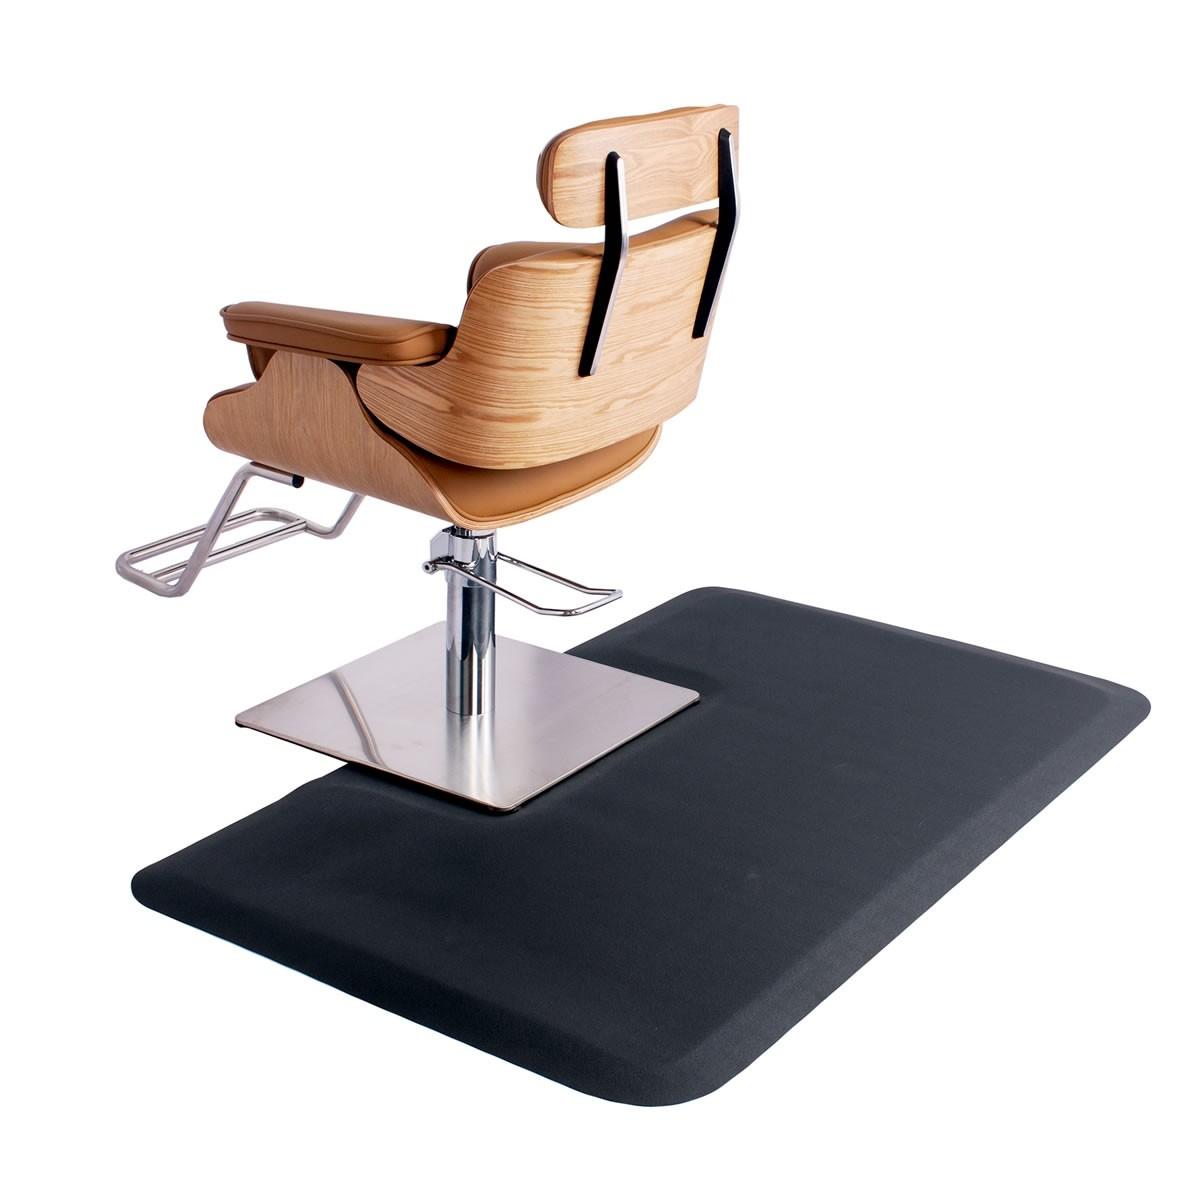 Square Salon Floor Mat for Square Base